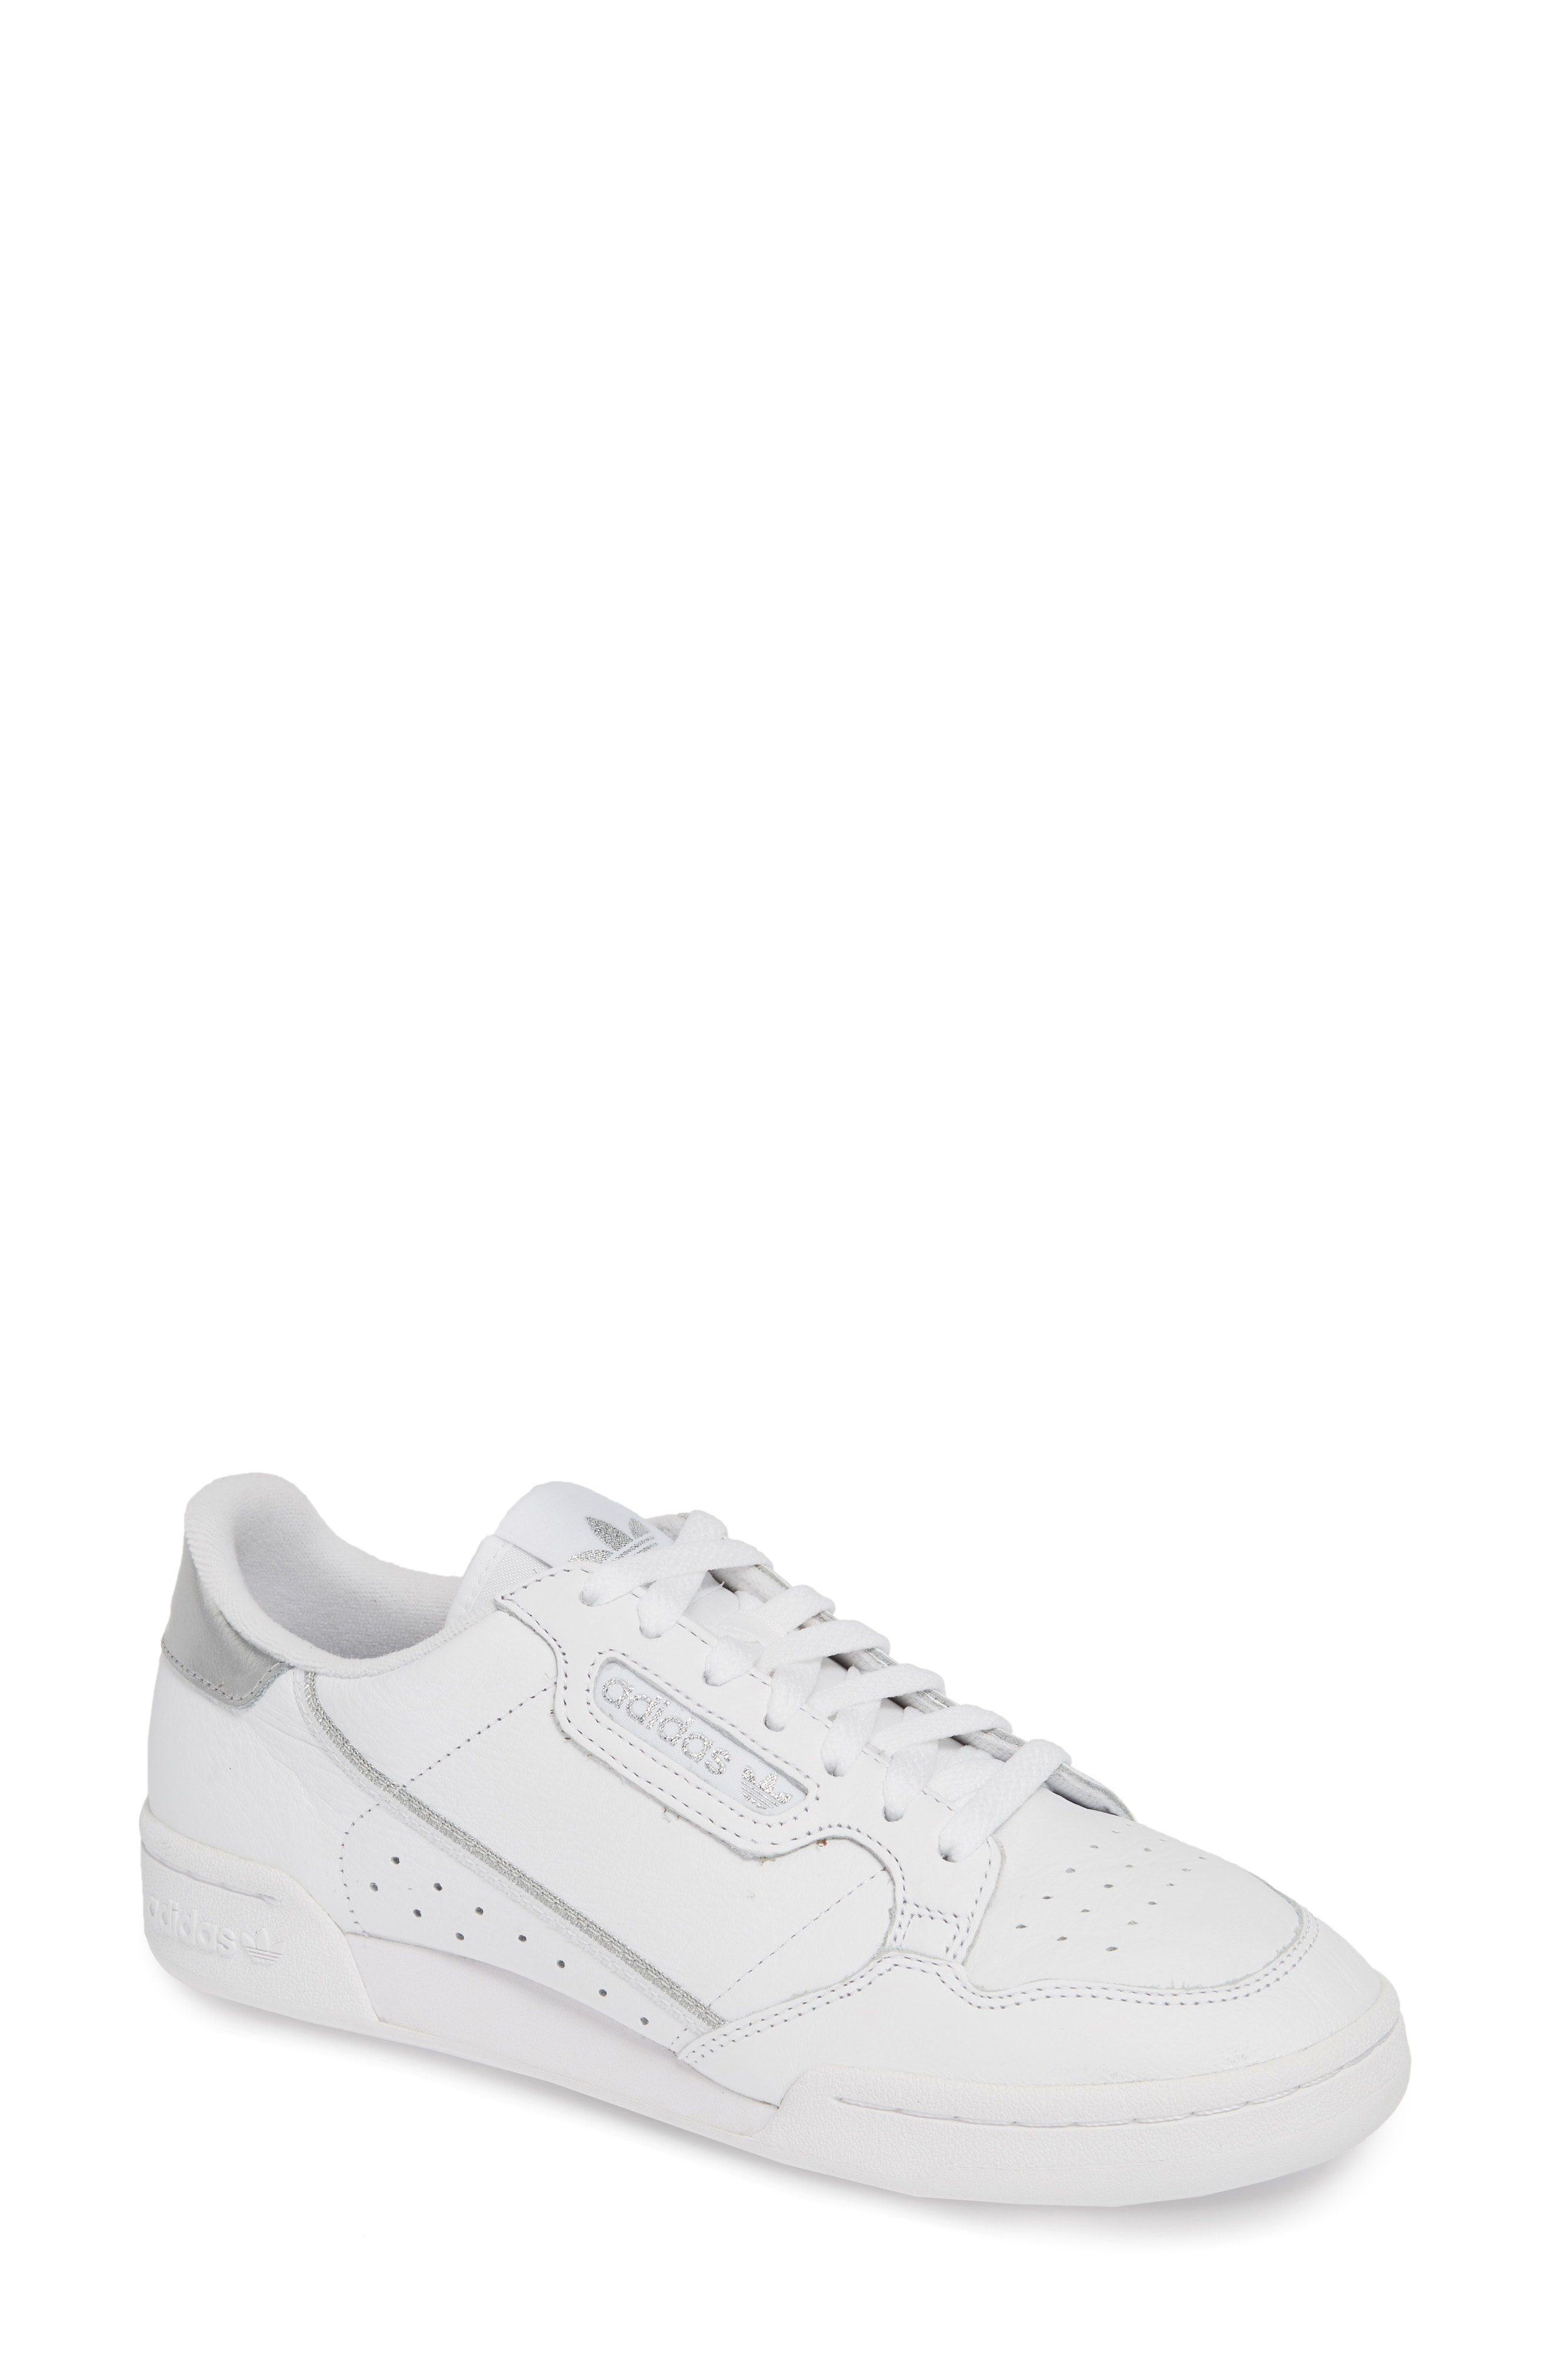 premium selection a388e fdc2c Adidas Originals Continental 80 Sneaker In White Scarlet Nav